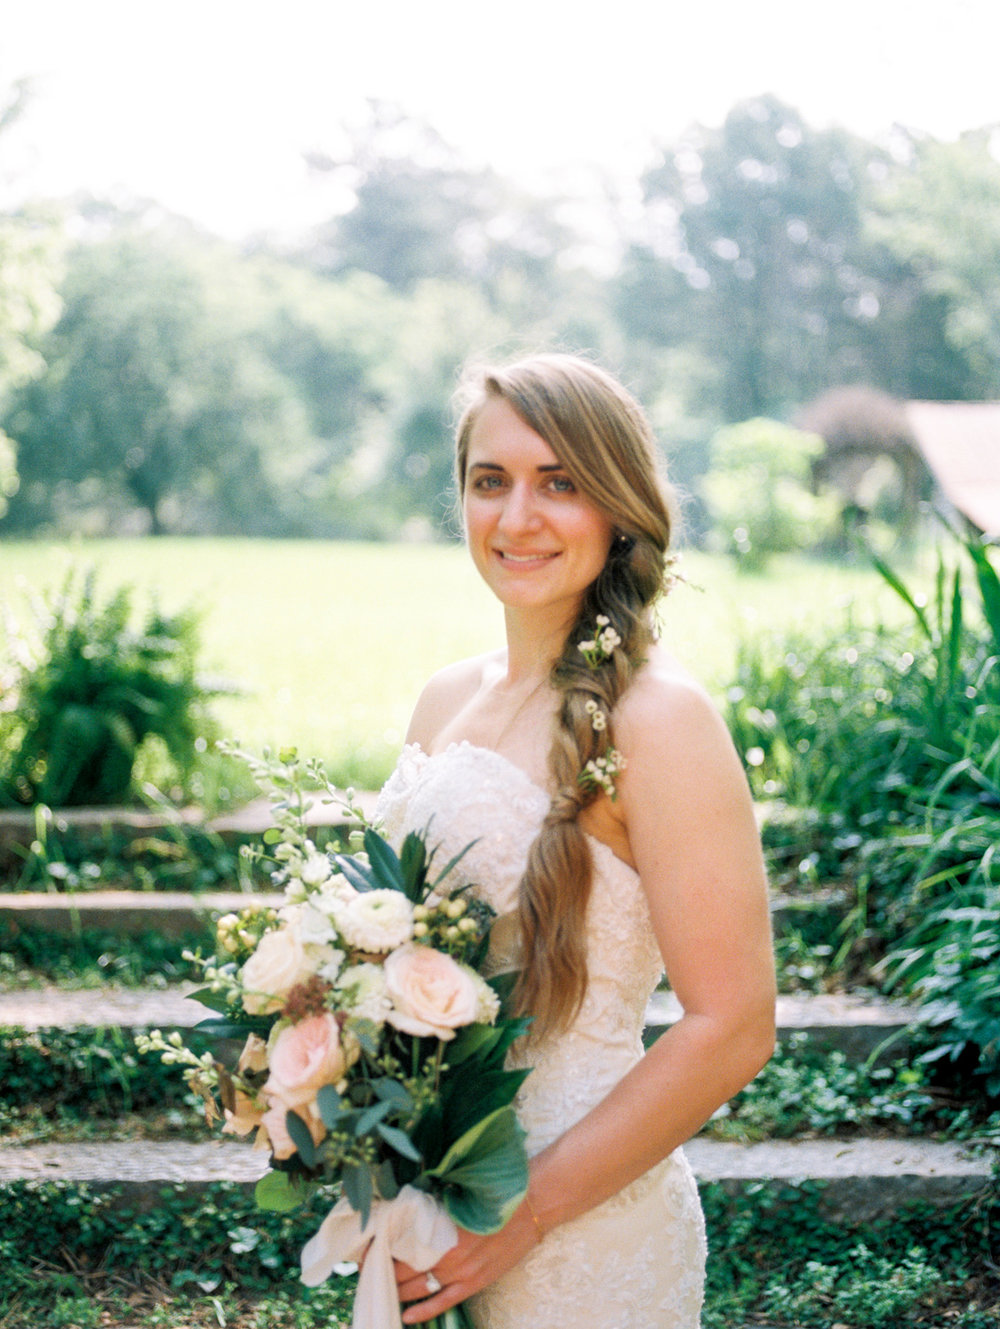 christinadavisphotography-romanticwedding-gardenweddinginspiration10.jpg